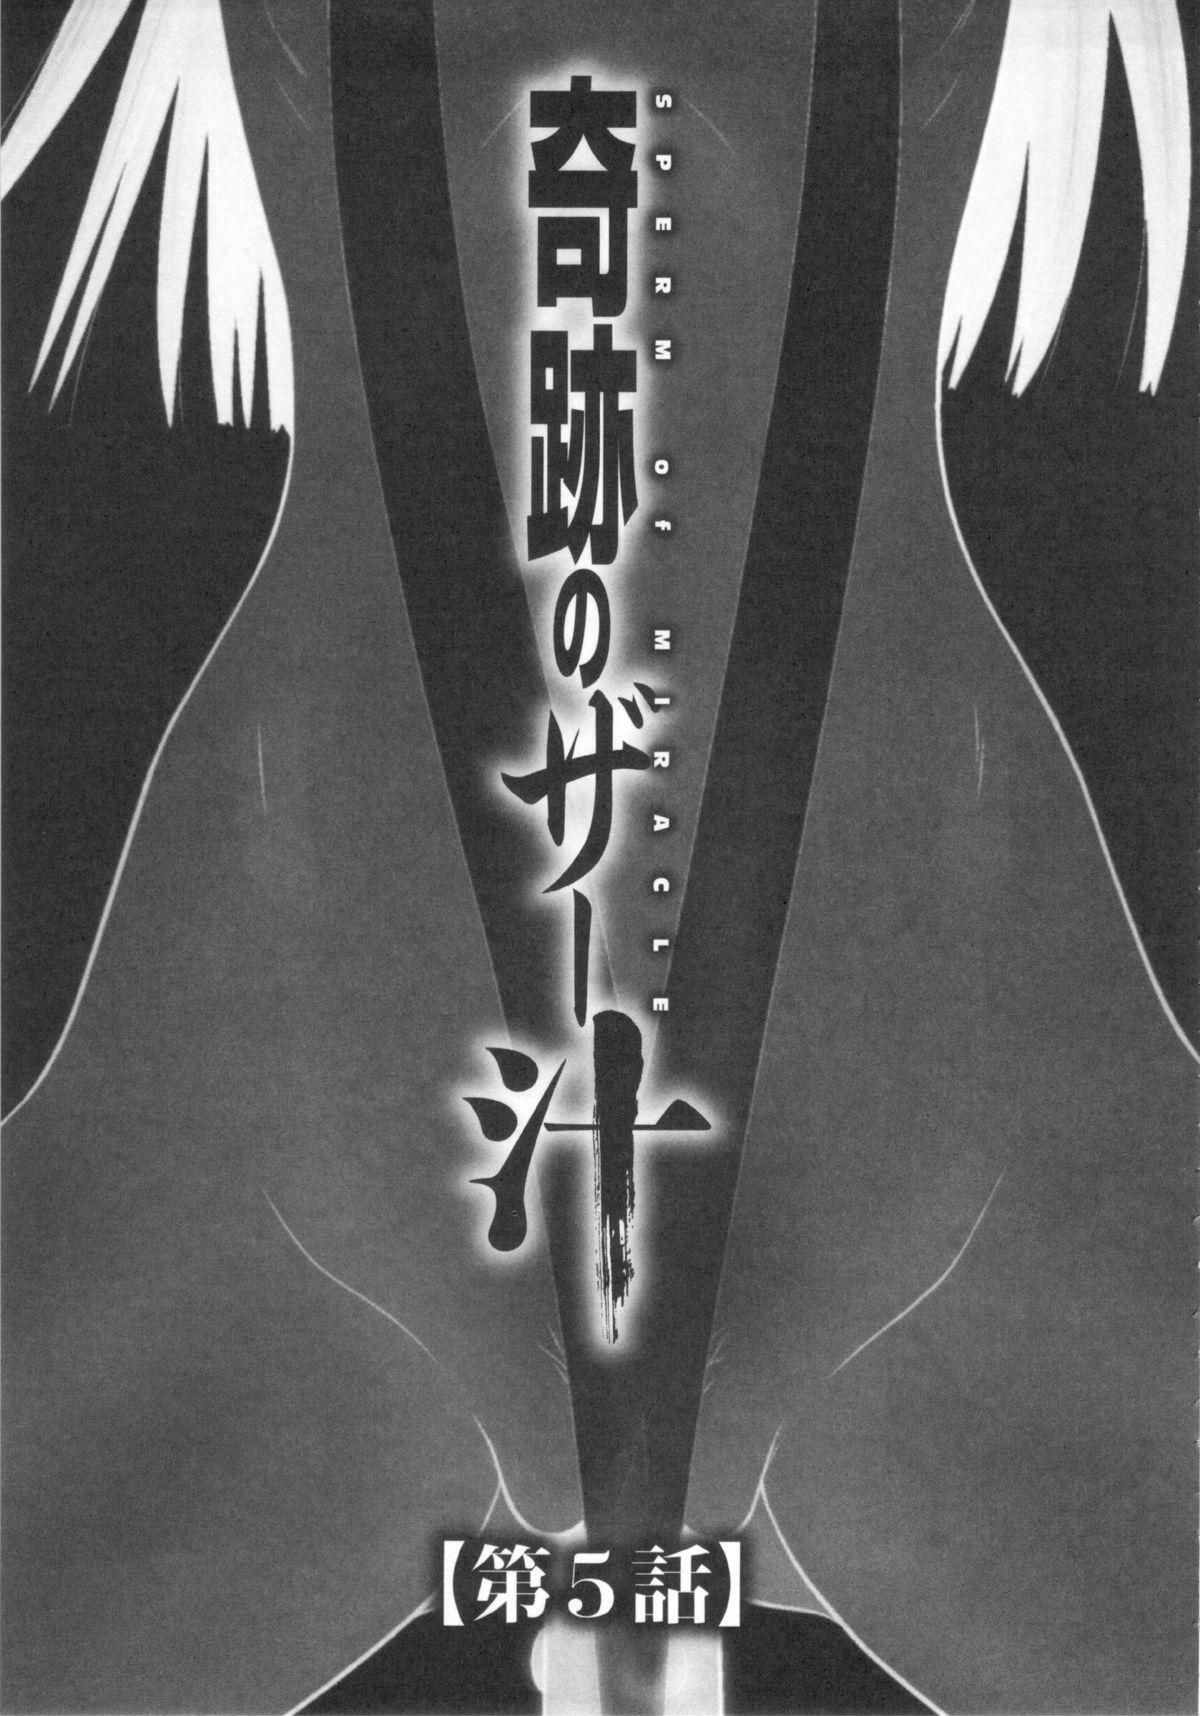 Kiseki No Zaajiru - Sperm of Miracle 83